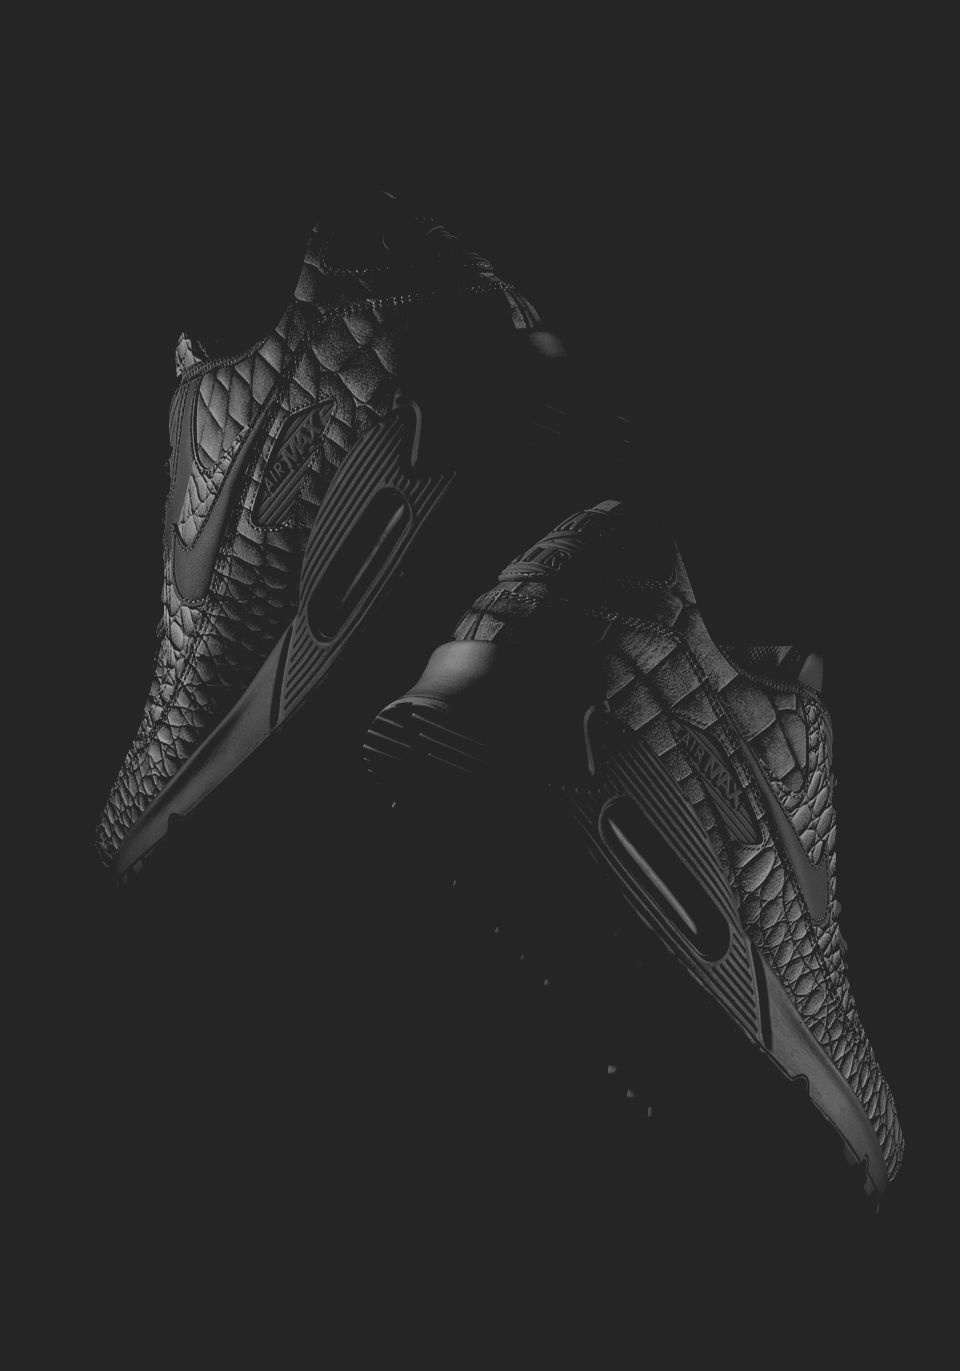 Nike Air Max 90 ID 'Leather Croc' 黑魂 Buy it @nike.com